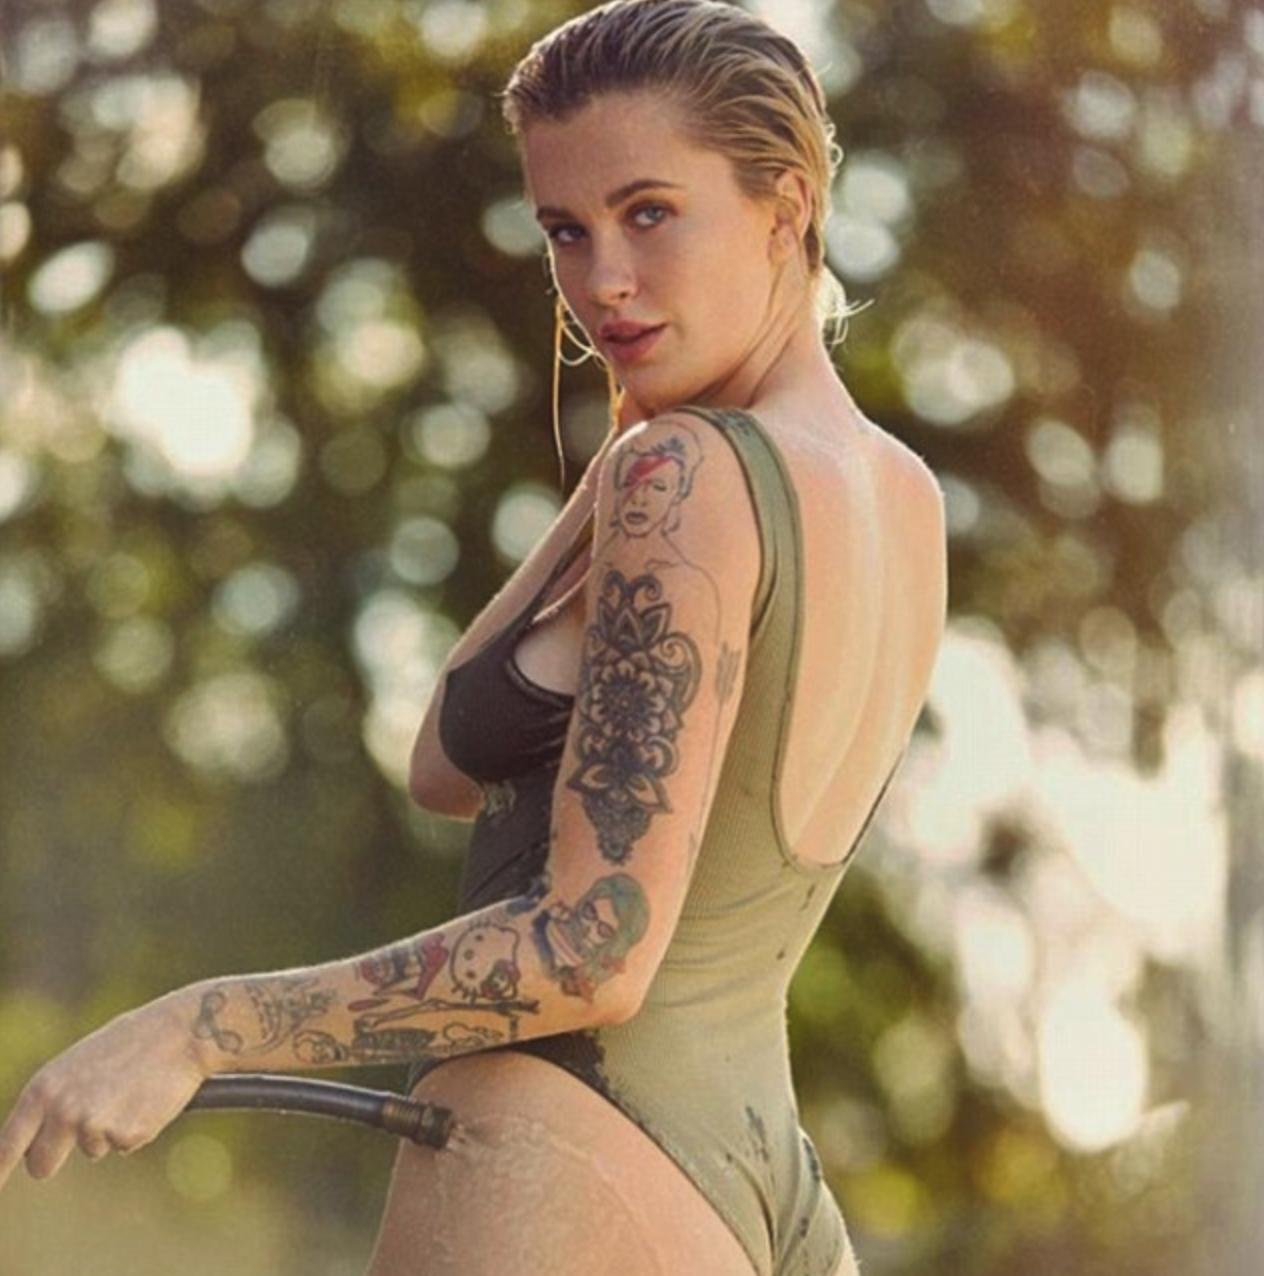 Ireland Baldwin Flaunts Her Crazy Curves in New Bikini Instagram Post